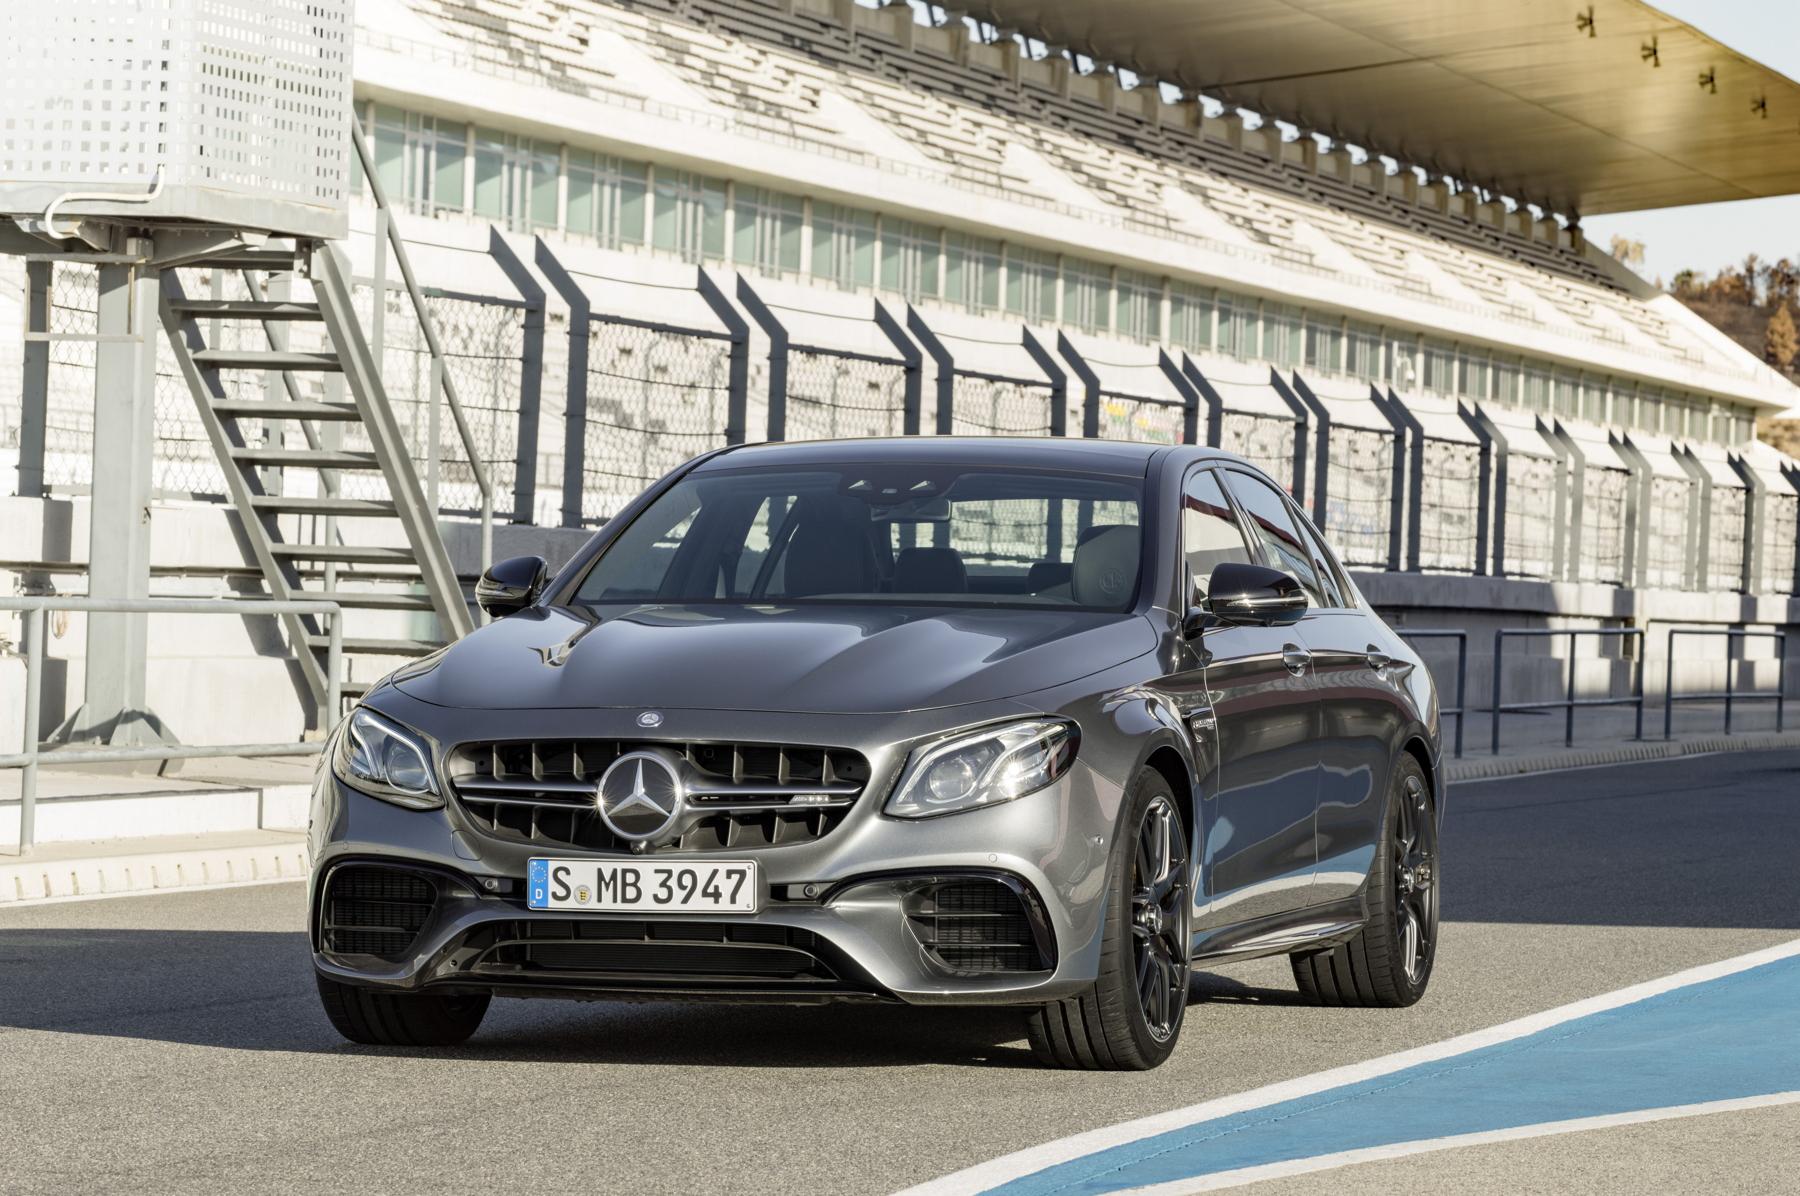 W 213, 2016 // Mercedes-AMG E 63 S, W 213,